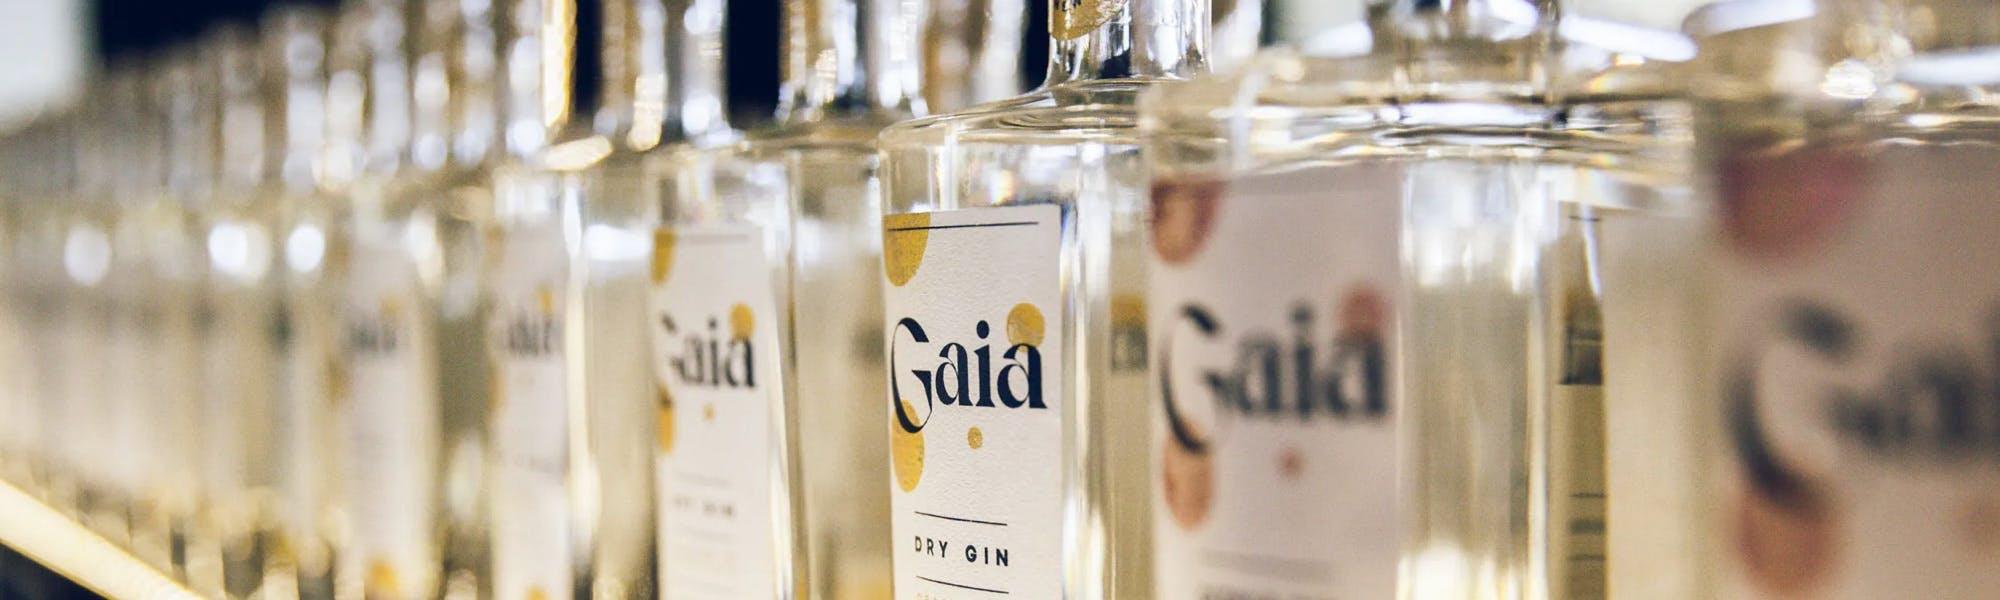 Gaia bottles lineup